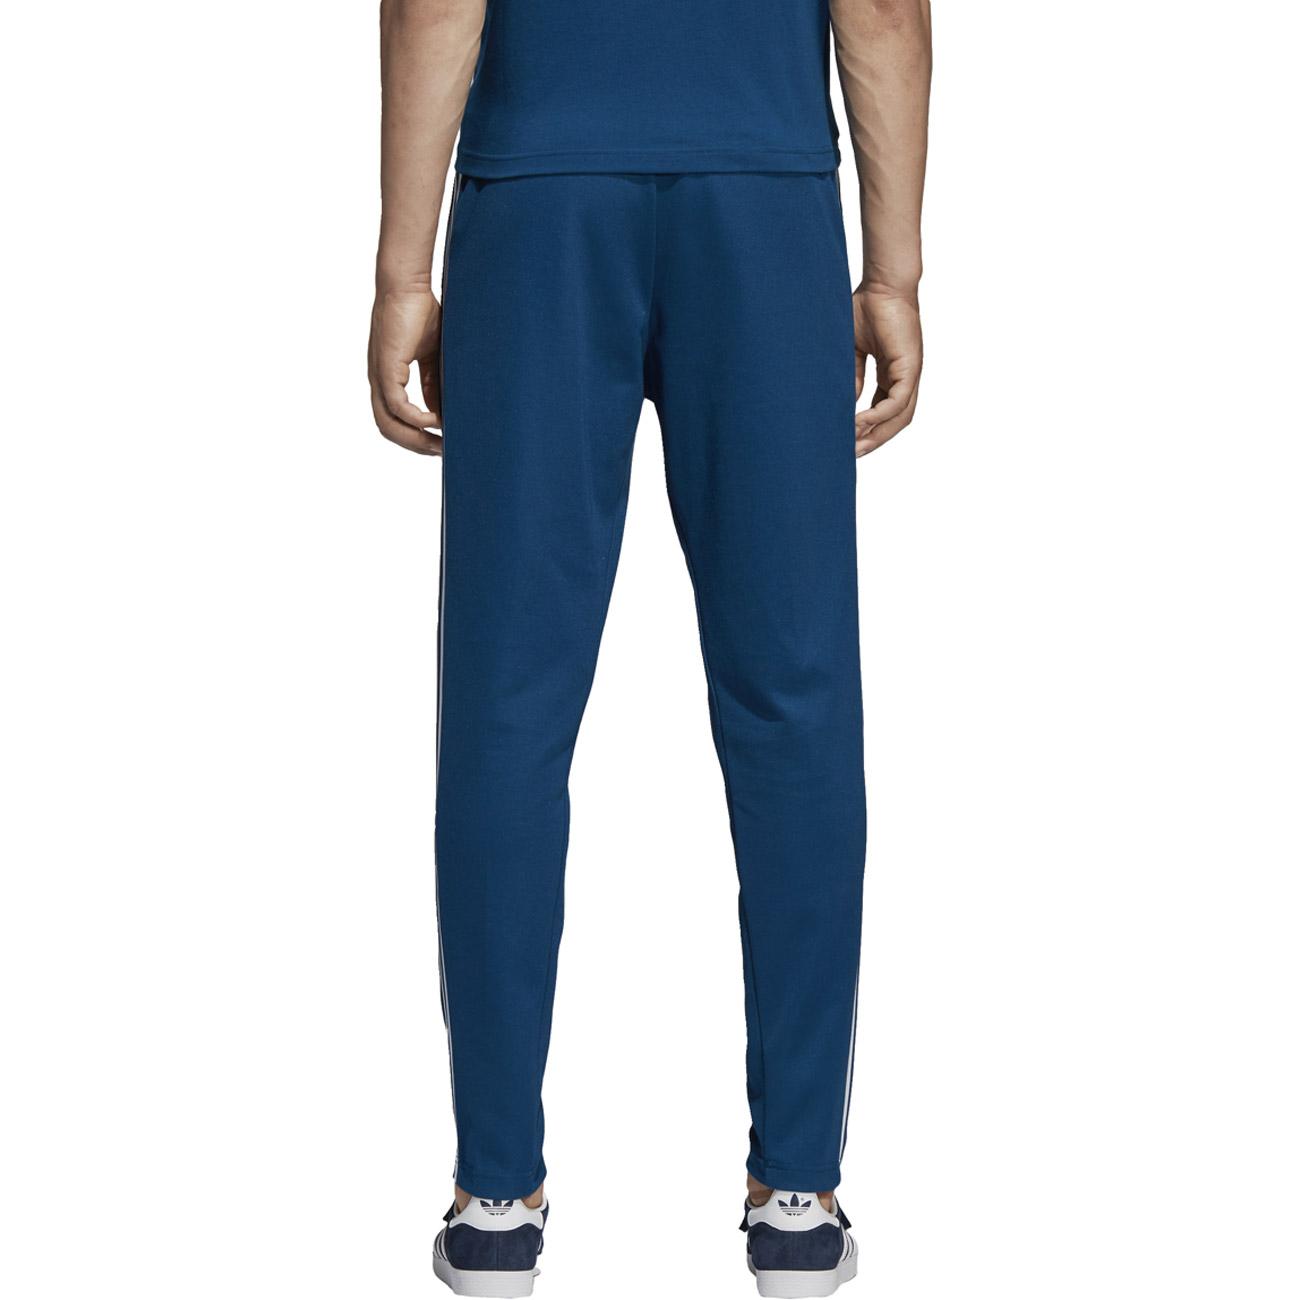 Adidas Originals Herren Jogging Hose BECKENBAUER TP